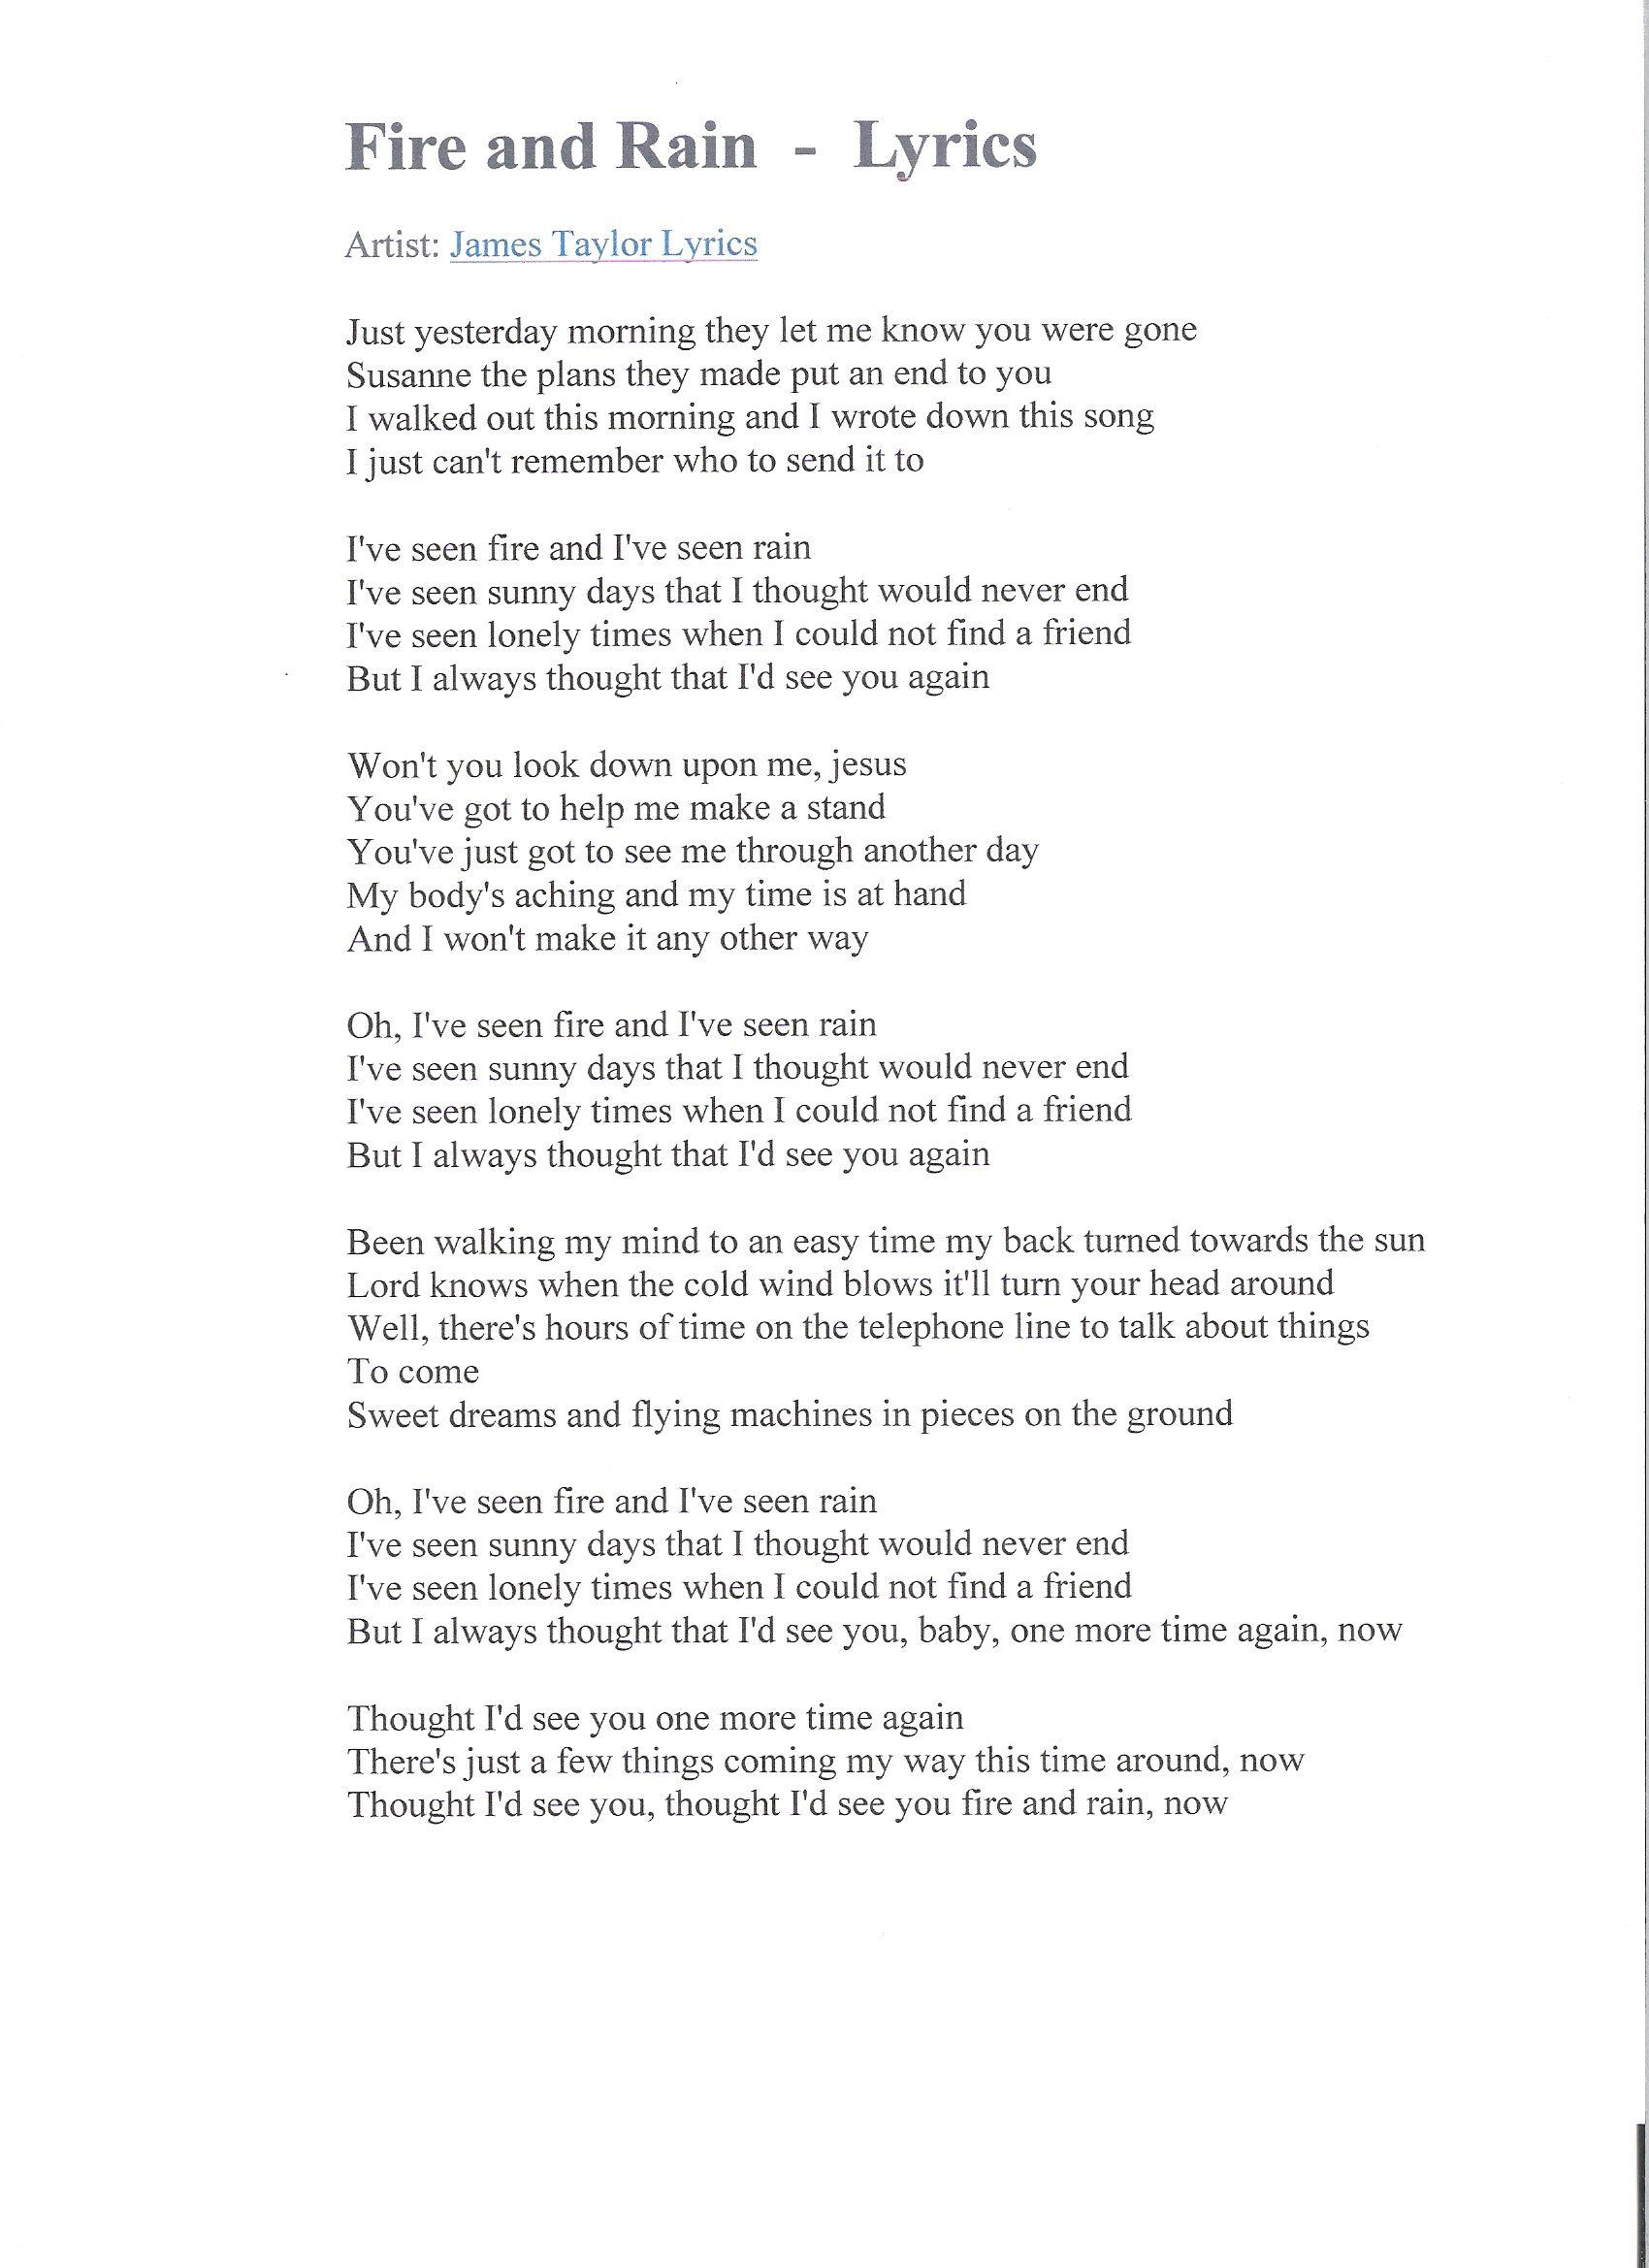 Come On Baby Put Your Hands On My Body Lyrics : hands, lyrics, Lyrics,